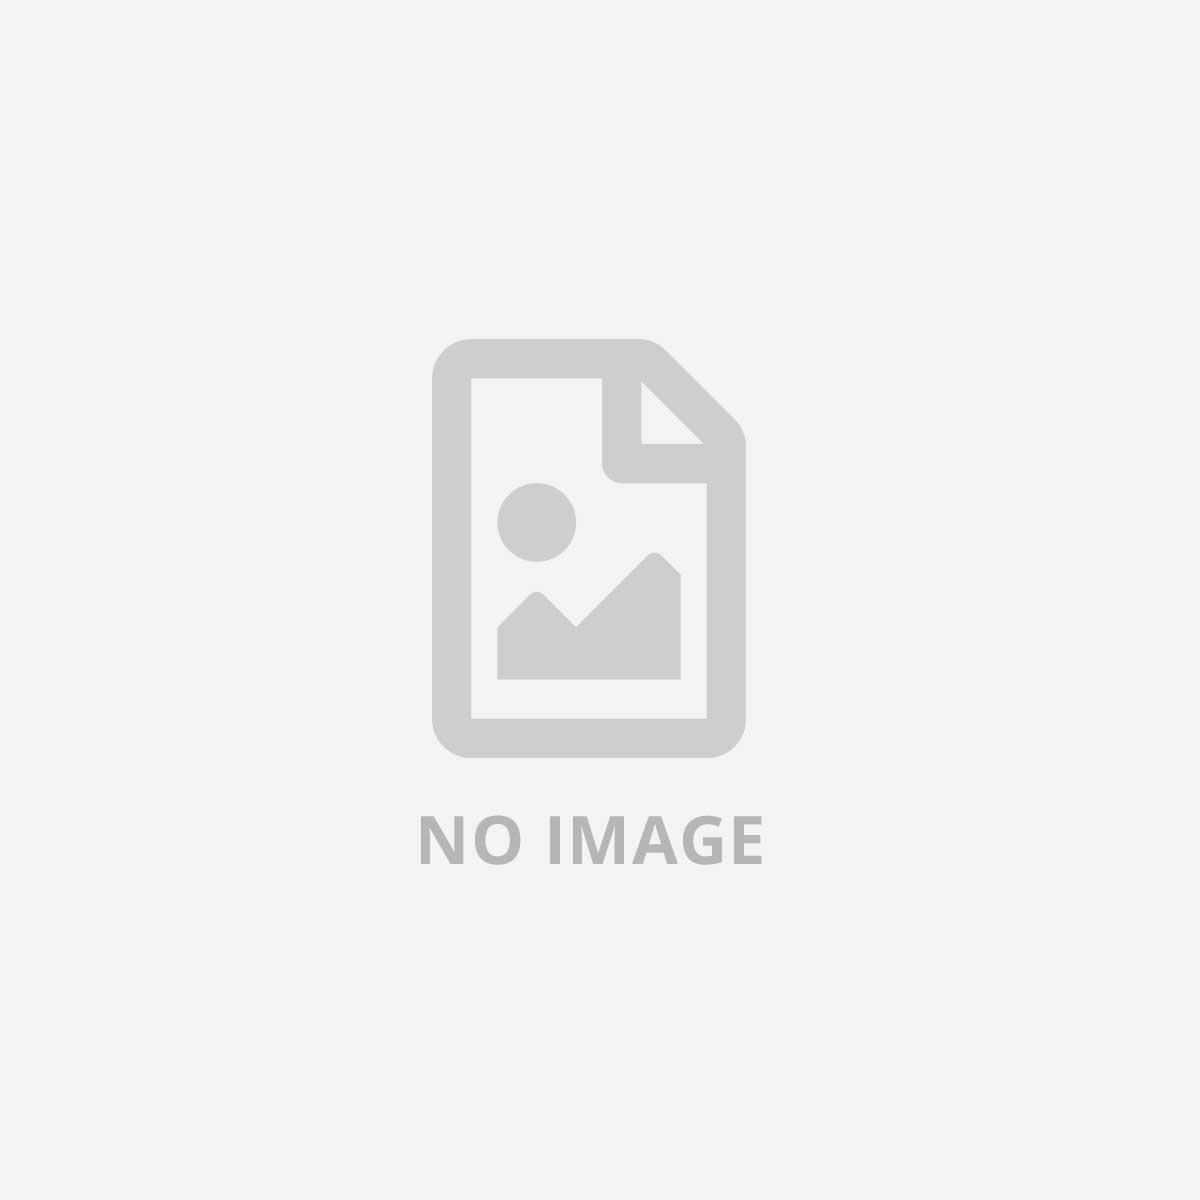 MEDION DAB+RADIO GREEN